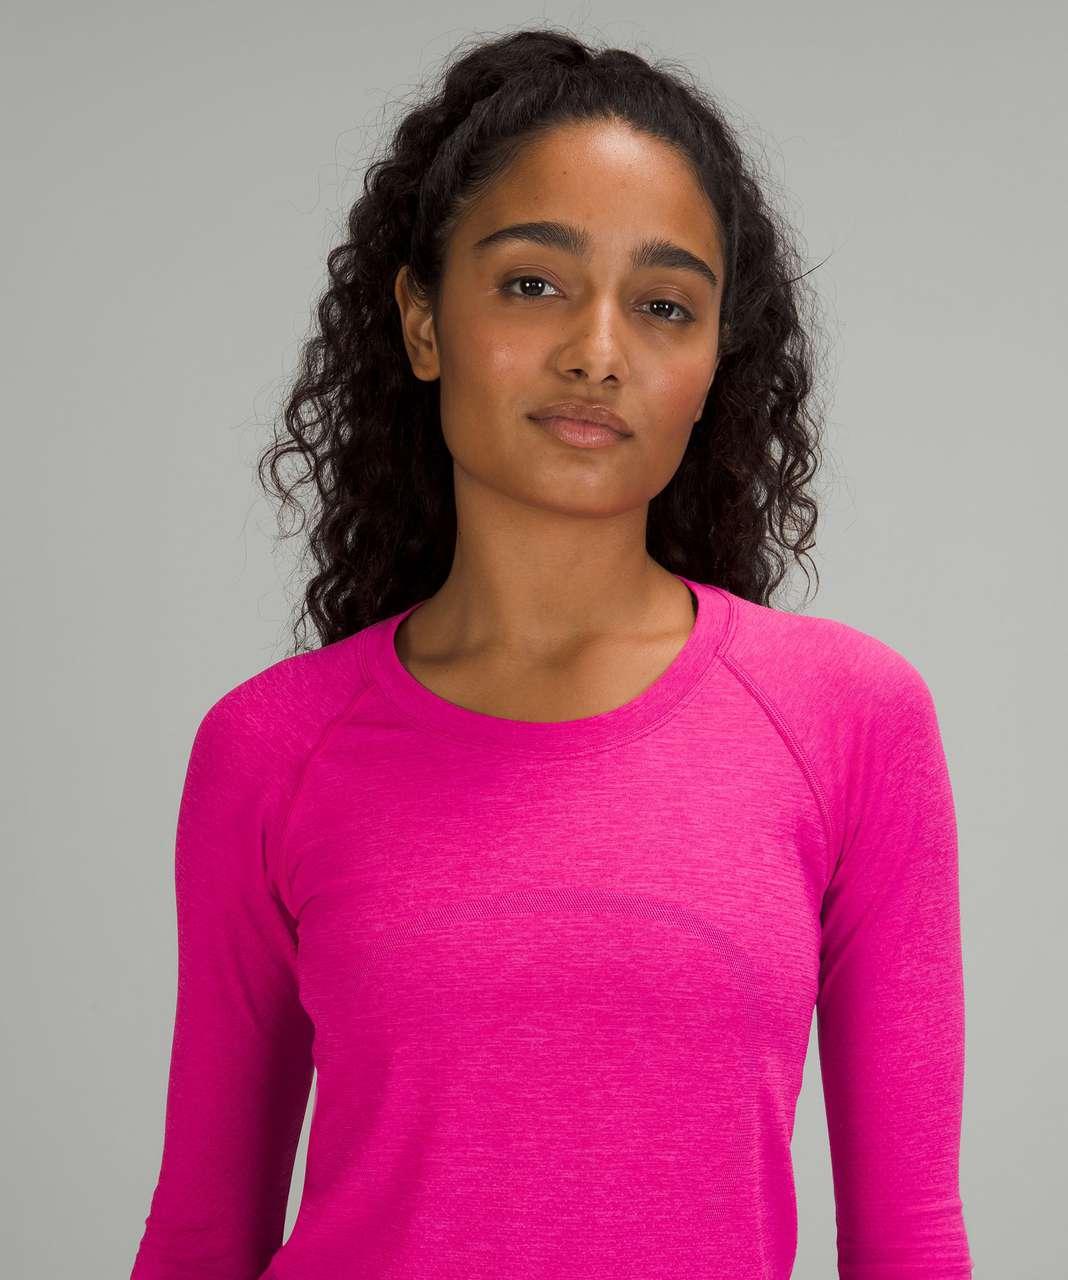 Lululemon Swiftly Tech Long Sleeve Shirt 2.0 - Pow Pink / Pow Pink